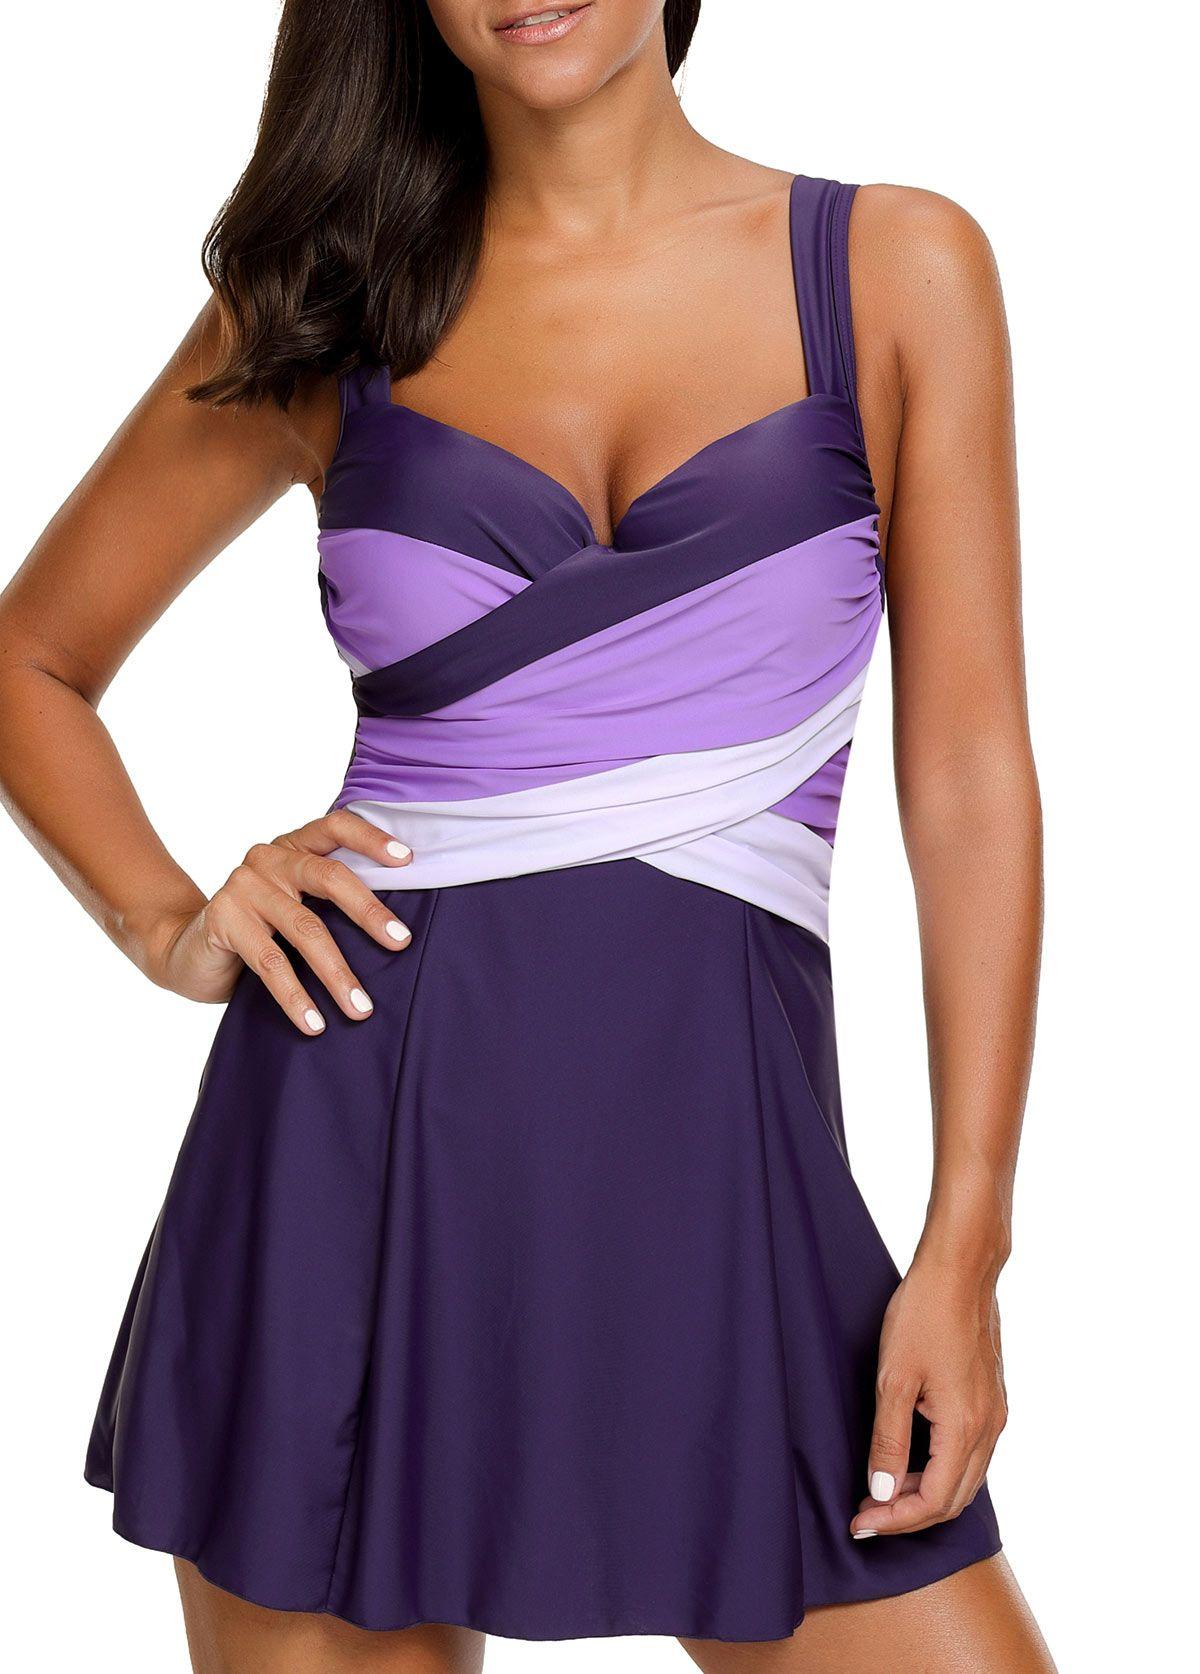 28c3c200fa972 Tie Back High Waist Purple Swimdress on sale only US$32.89 now, buy cheap  Tie Back High Waist Purple Swimdress at liligal.com